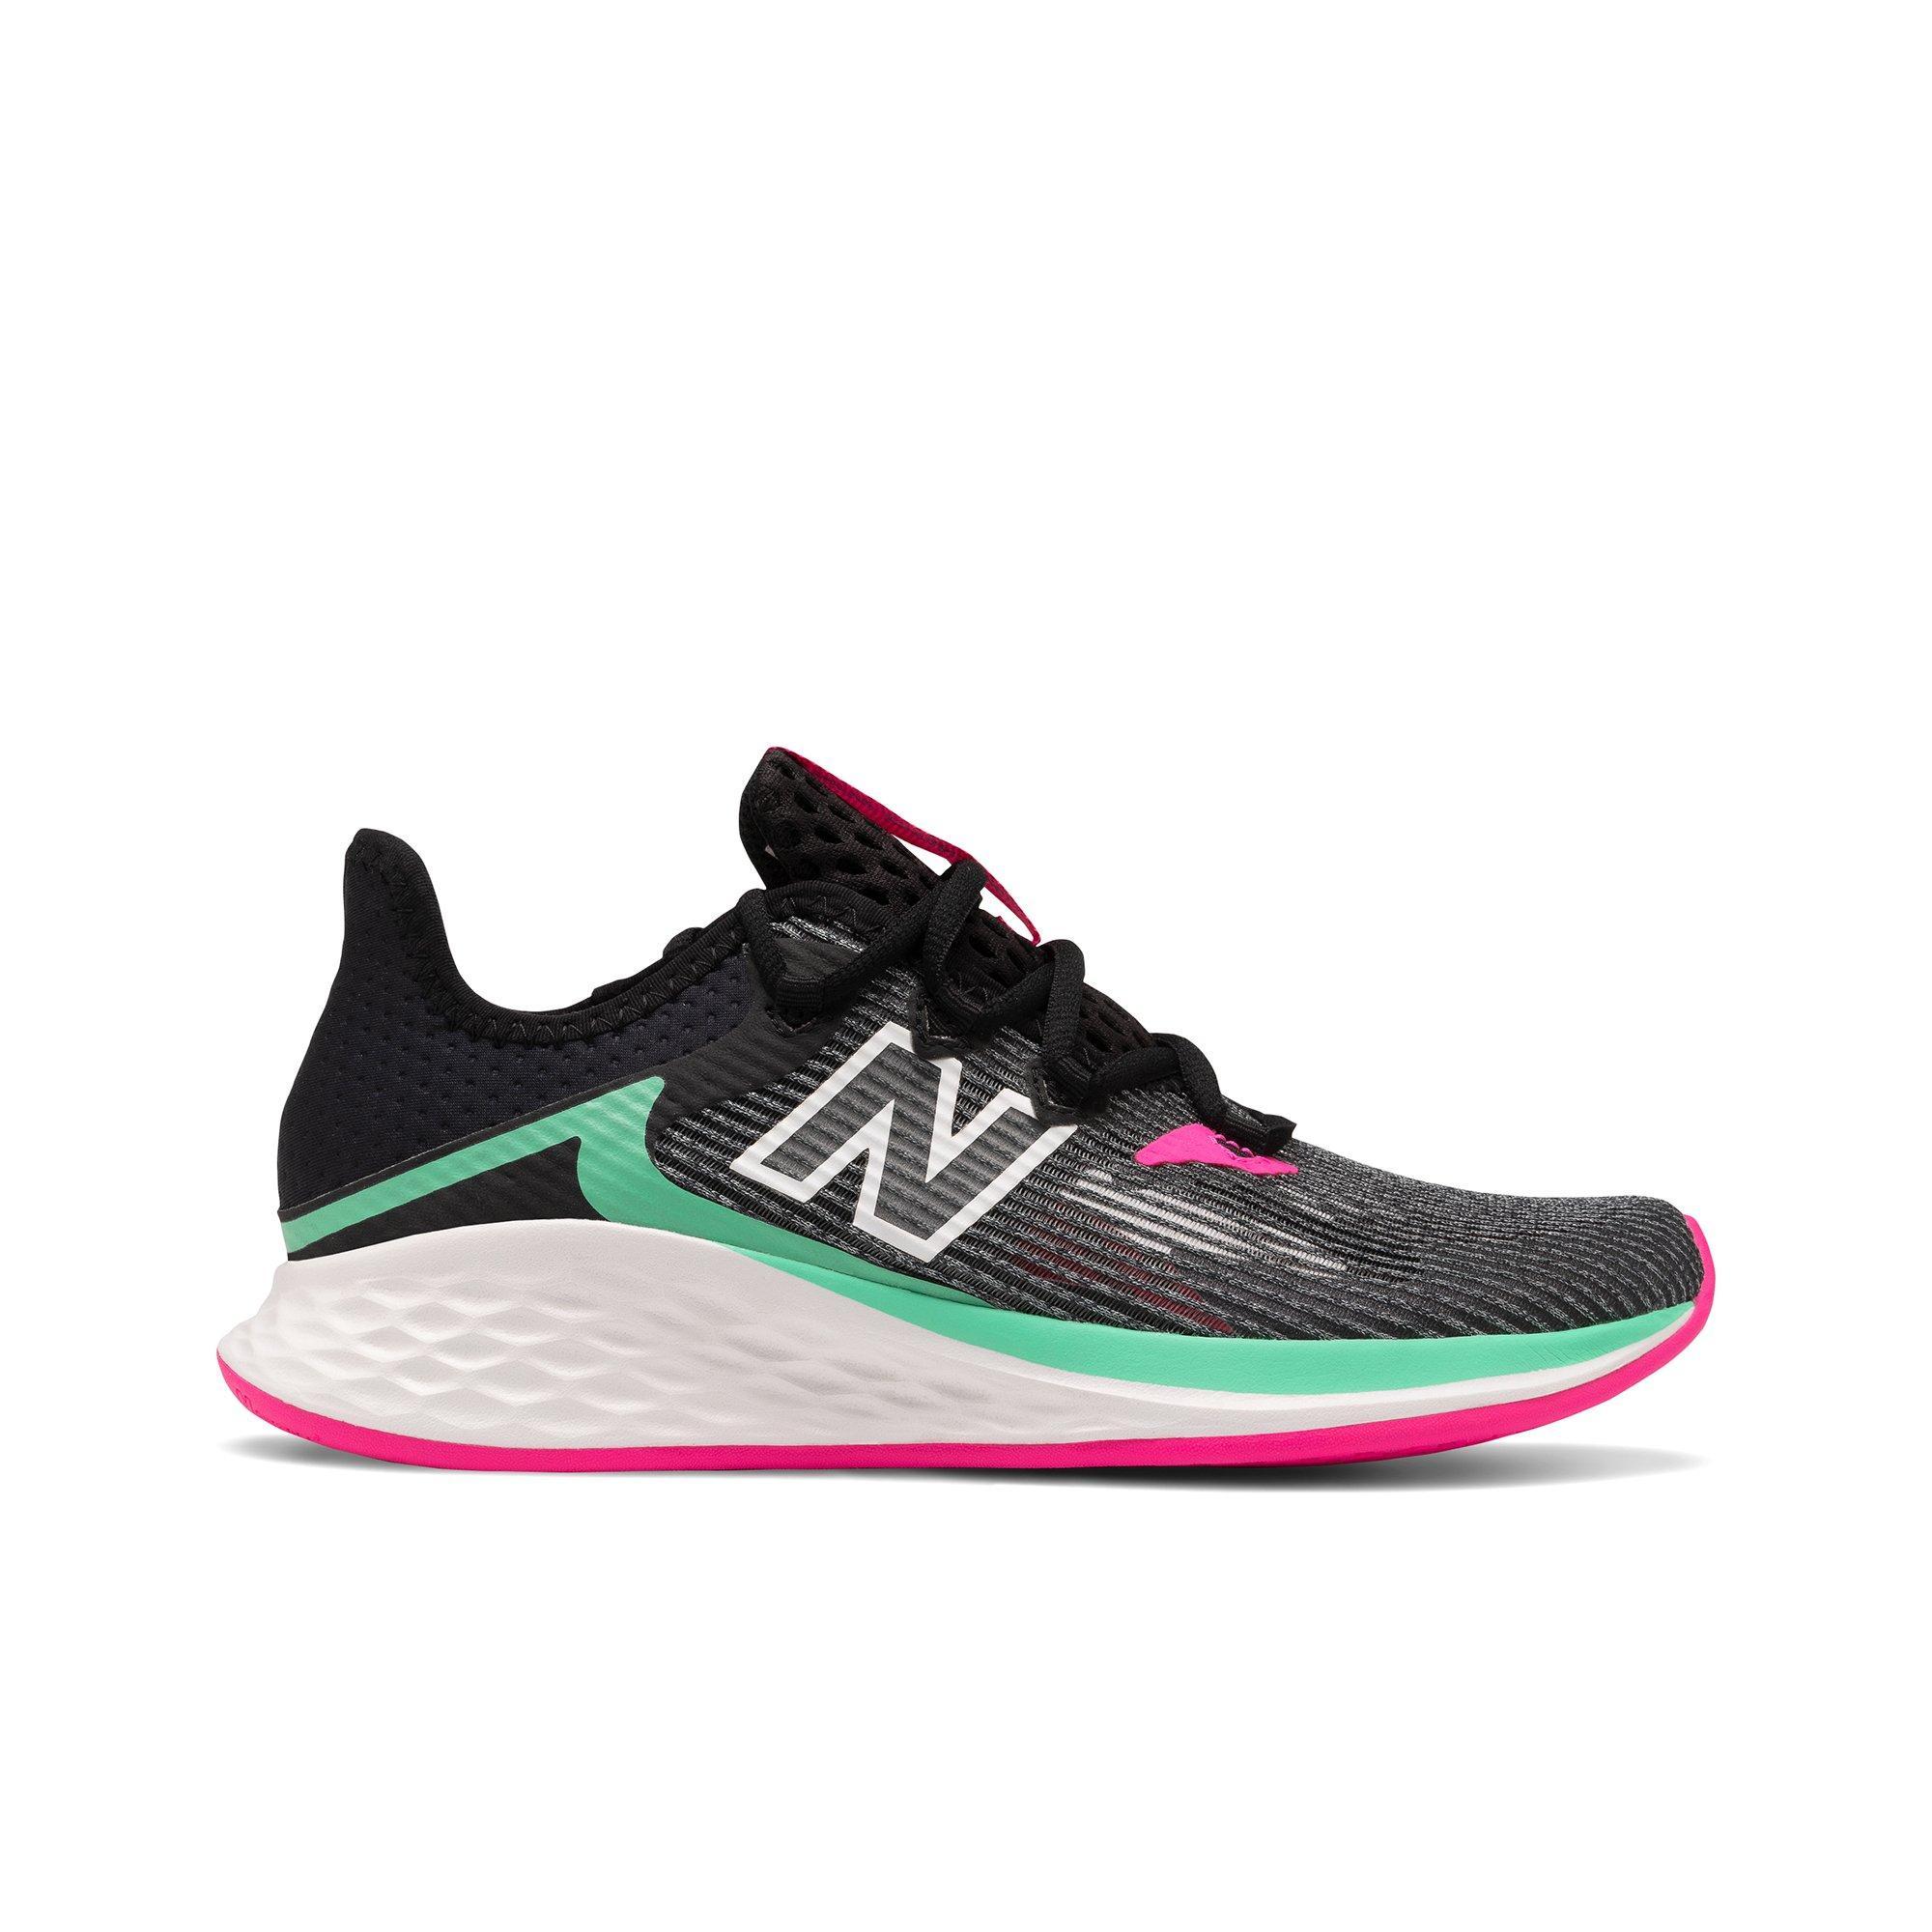 mizuno womens volleyball shoes size 8 x 1 nm black cm 2018